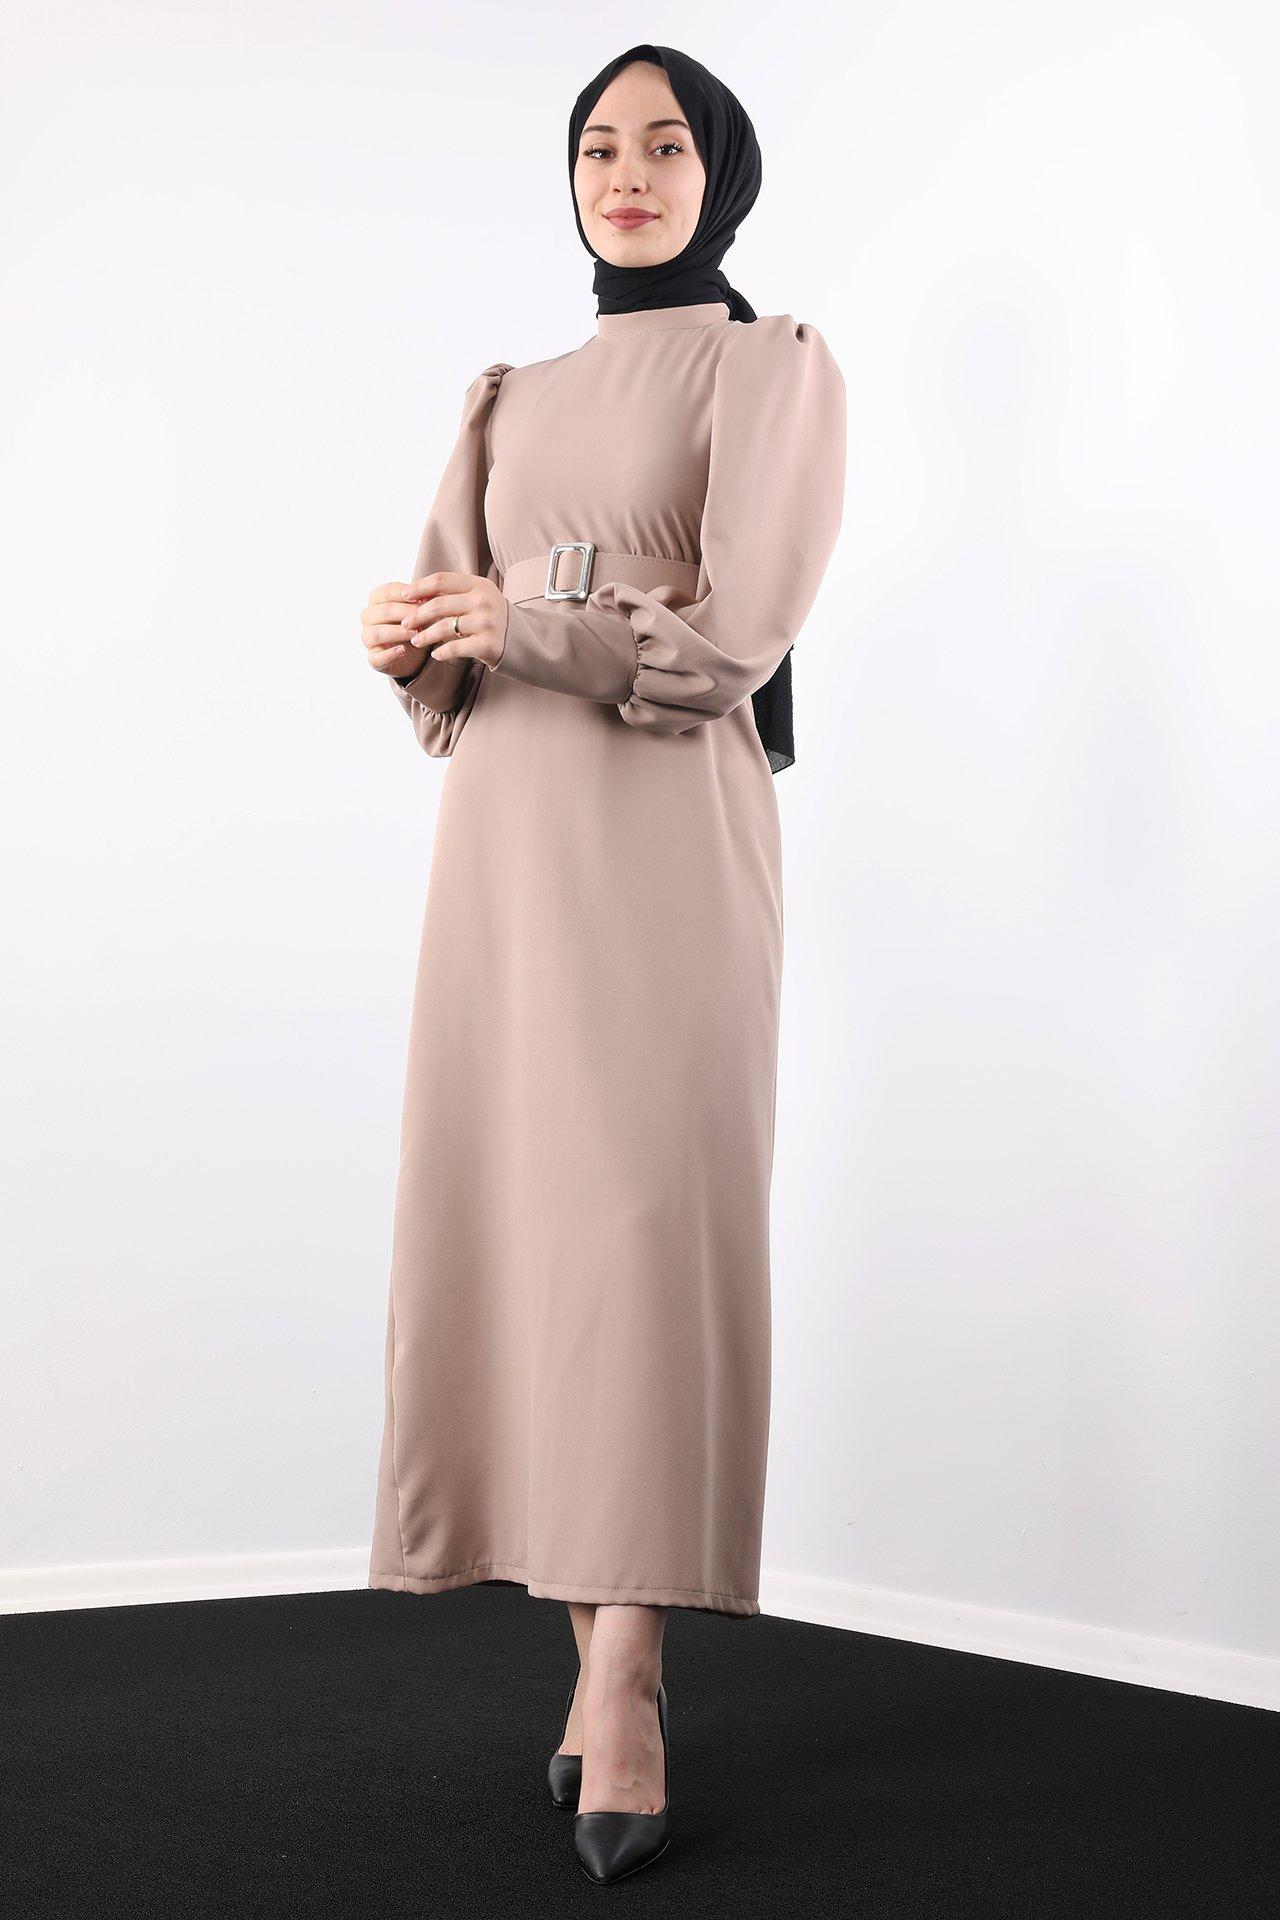 GİZAGİYİM - Kemerli Düz Elbise Vizon